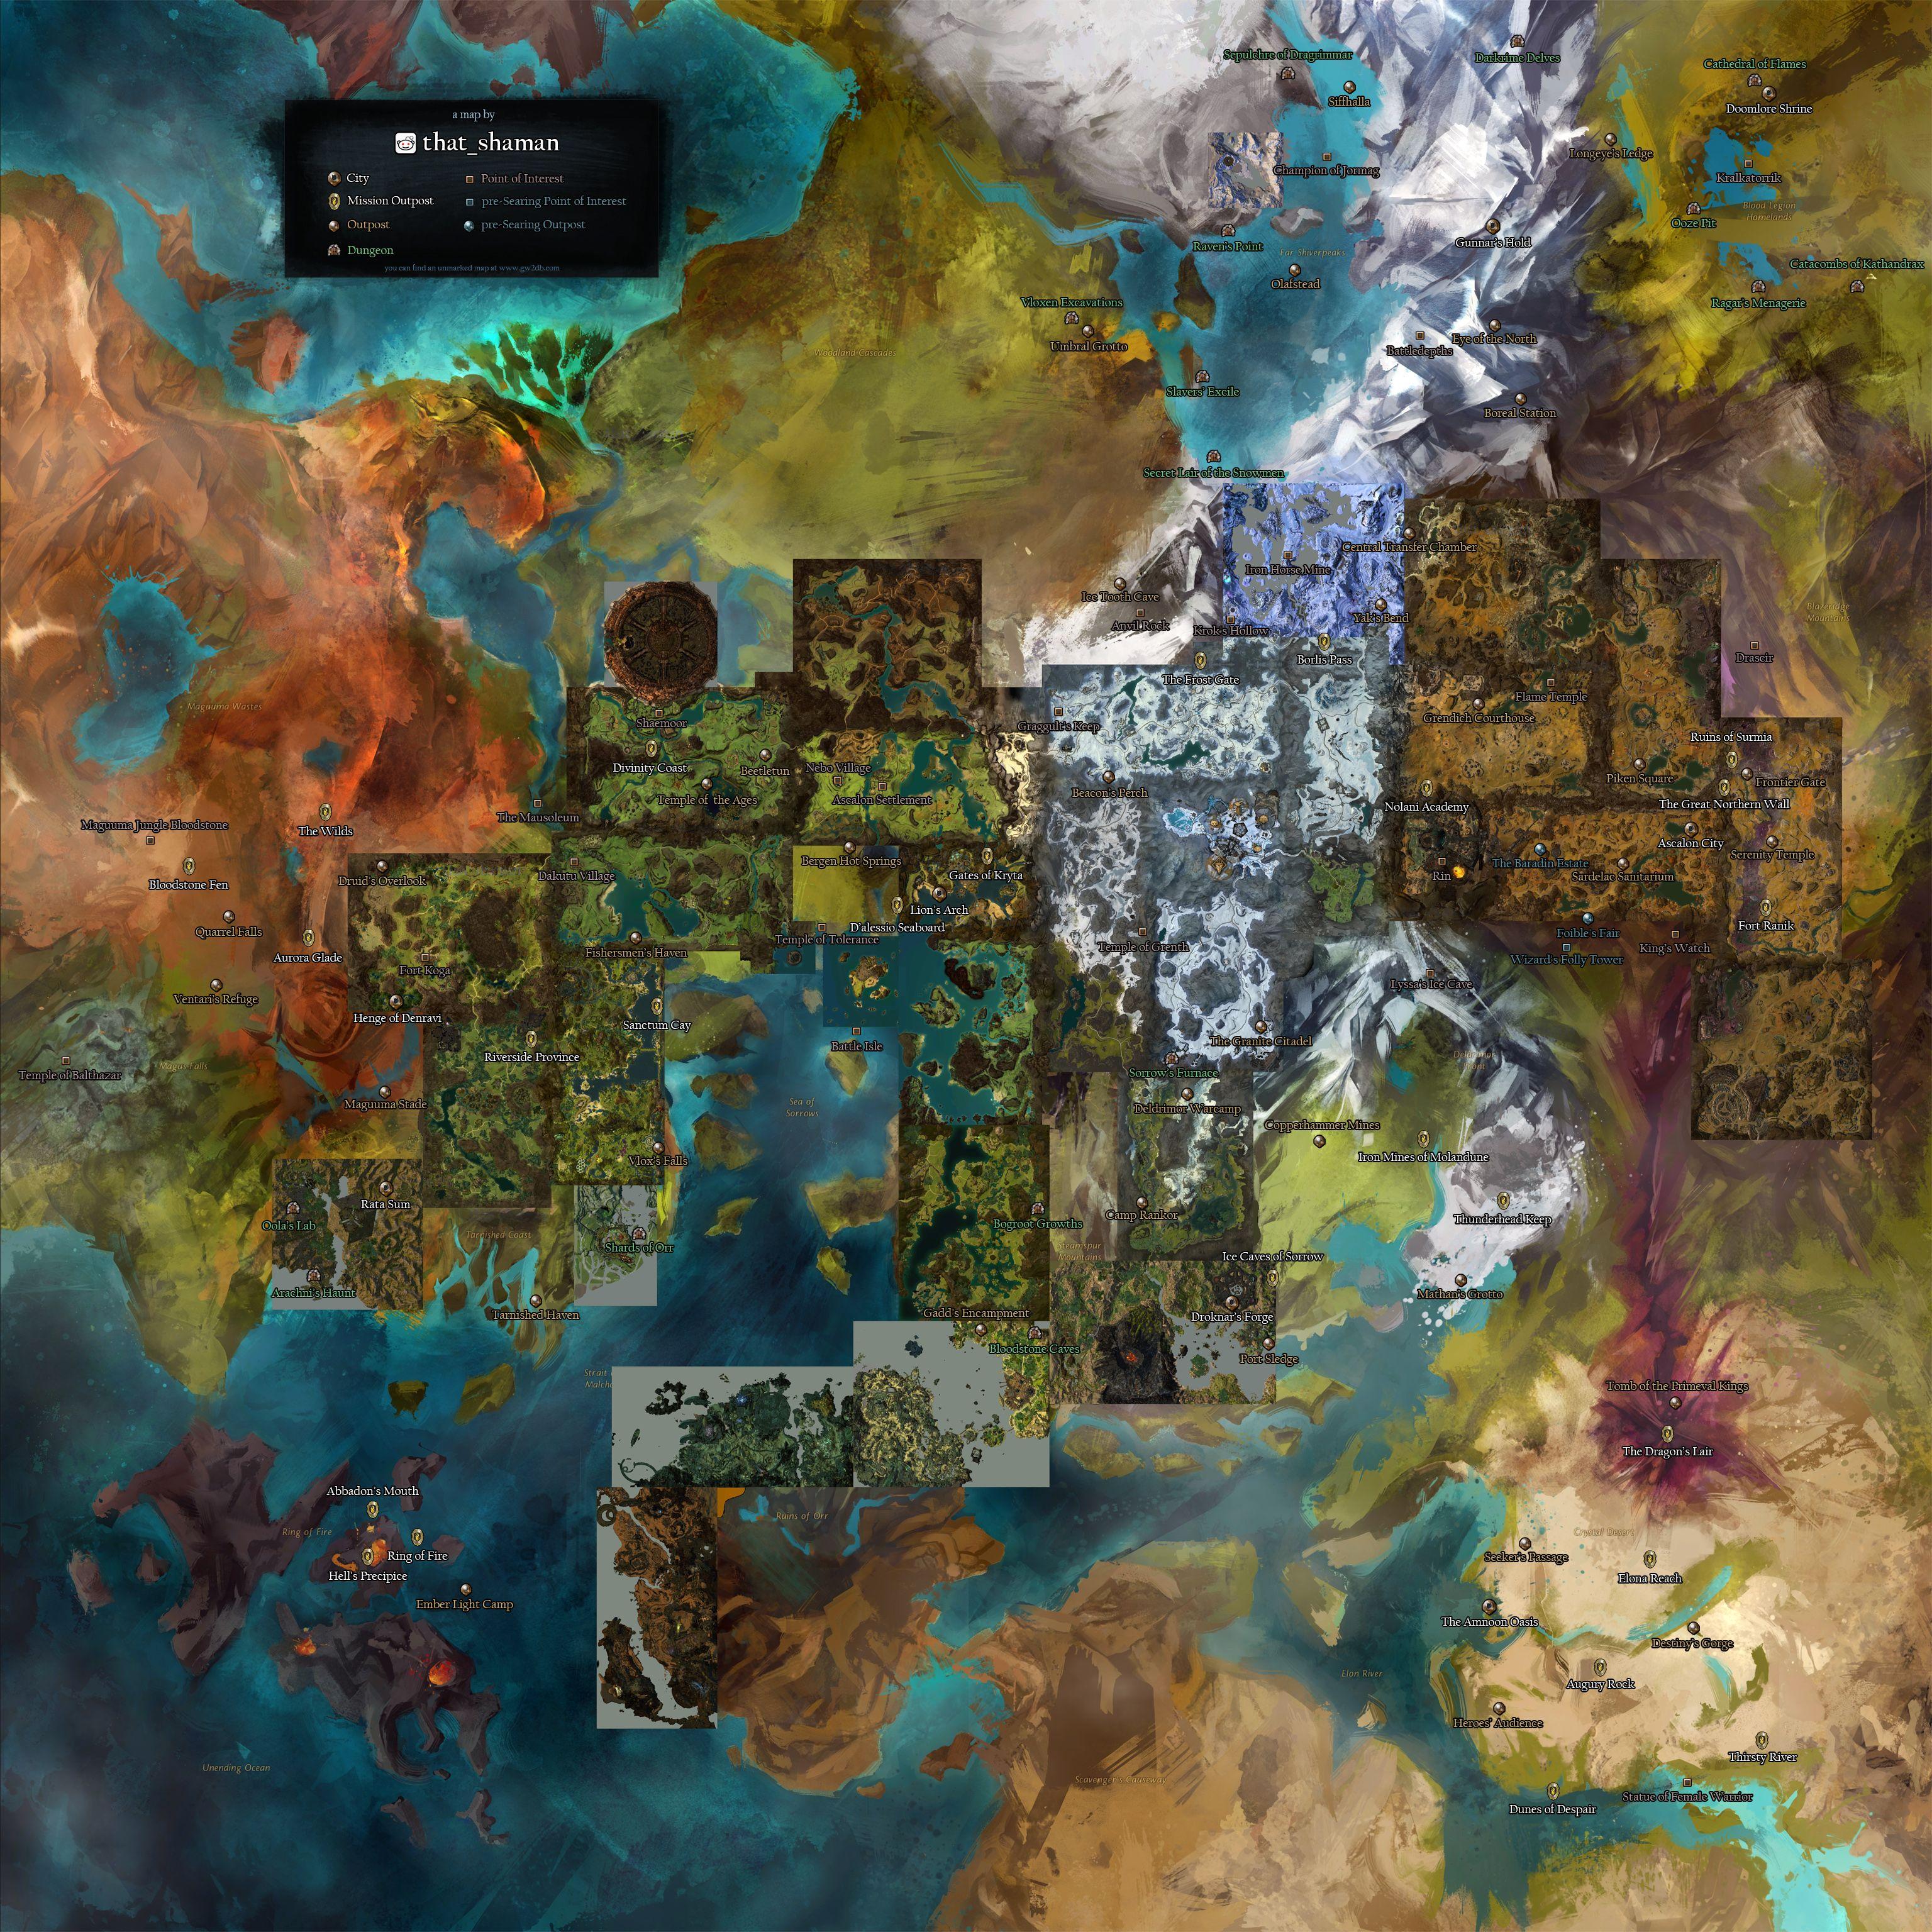 Guild Wars 1 World Map.Guild Wars 2 World Map Guild Wars Pinterest Guild Wars